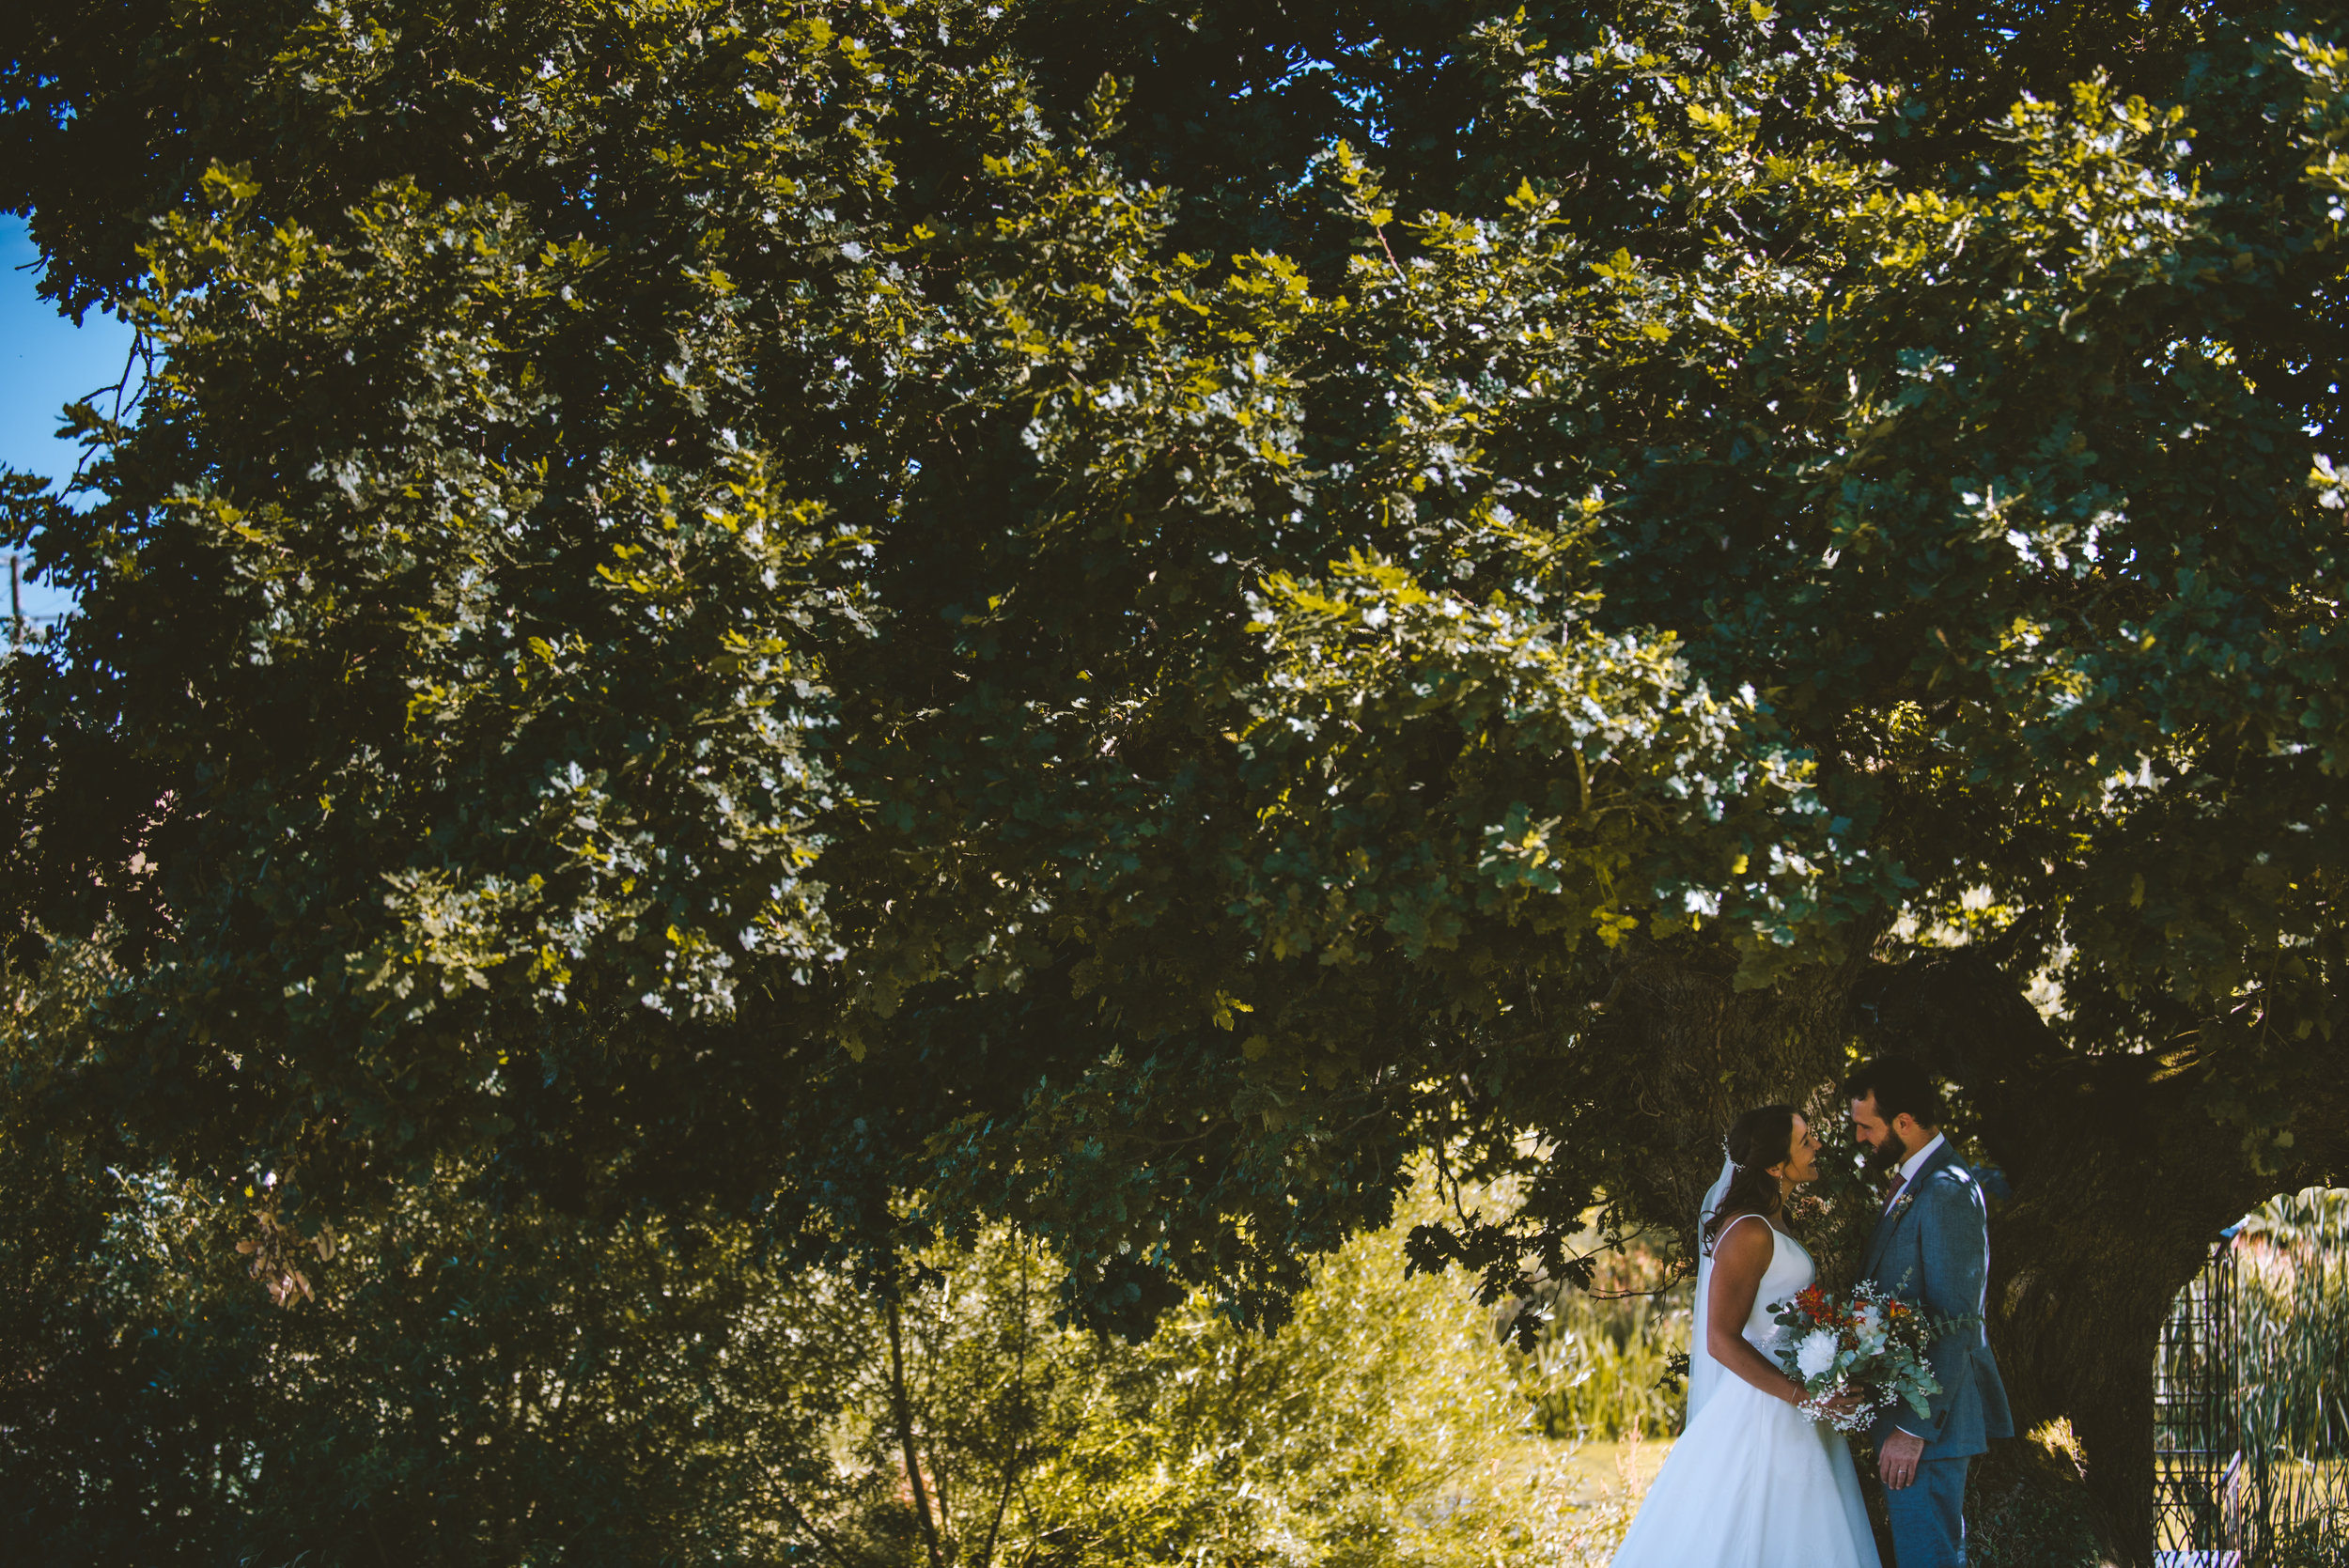 ashbarton-estate-wedding-photographer-mark-shaw-38.jpg